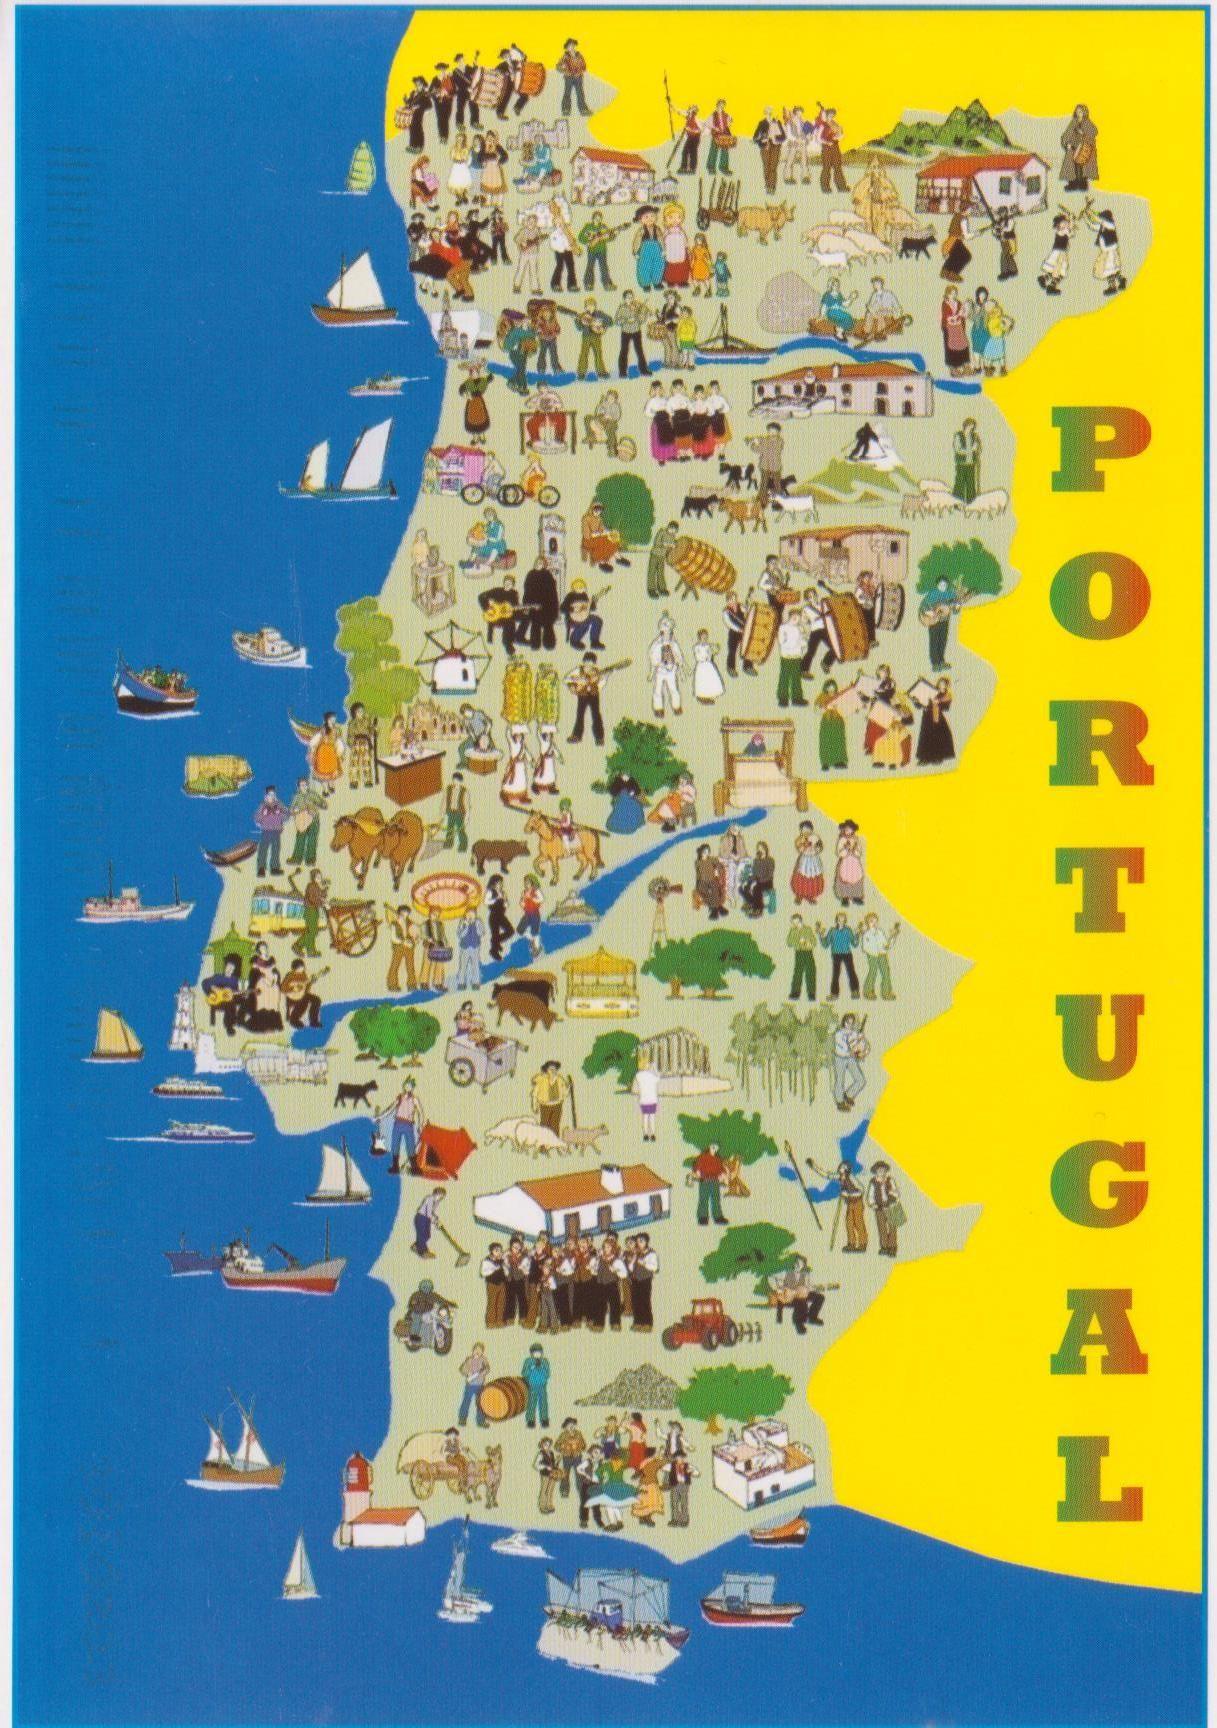 Pin by karim on mathematics Pinterest Portugal Travel posters